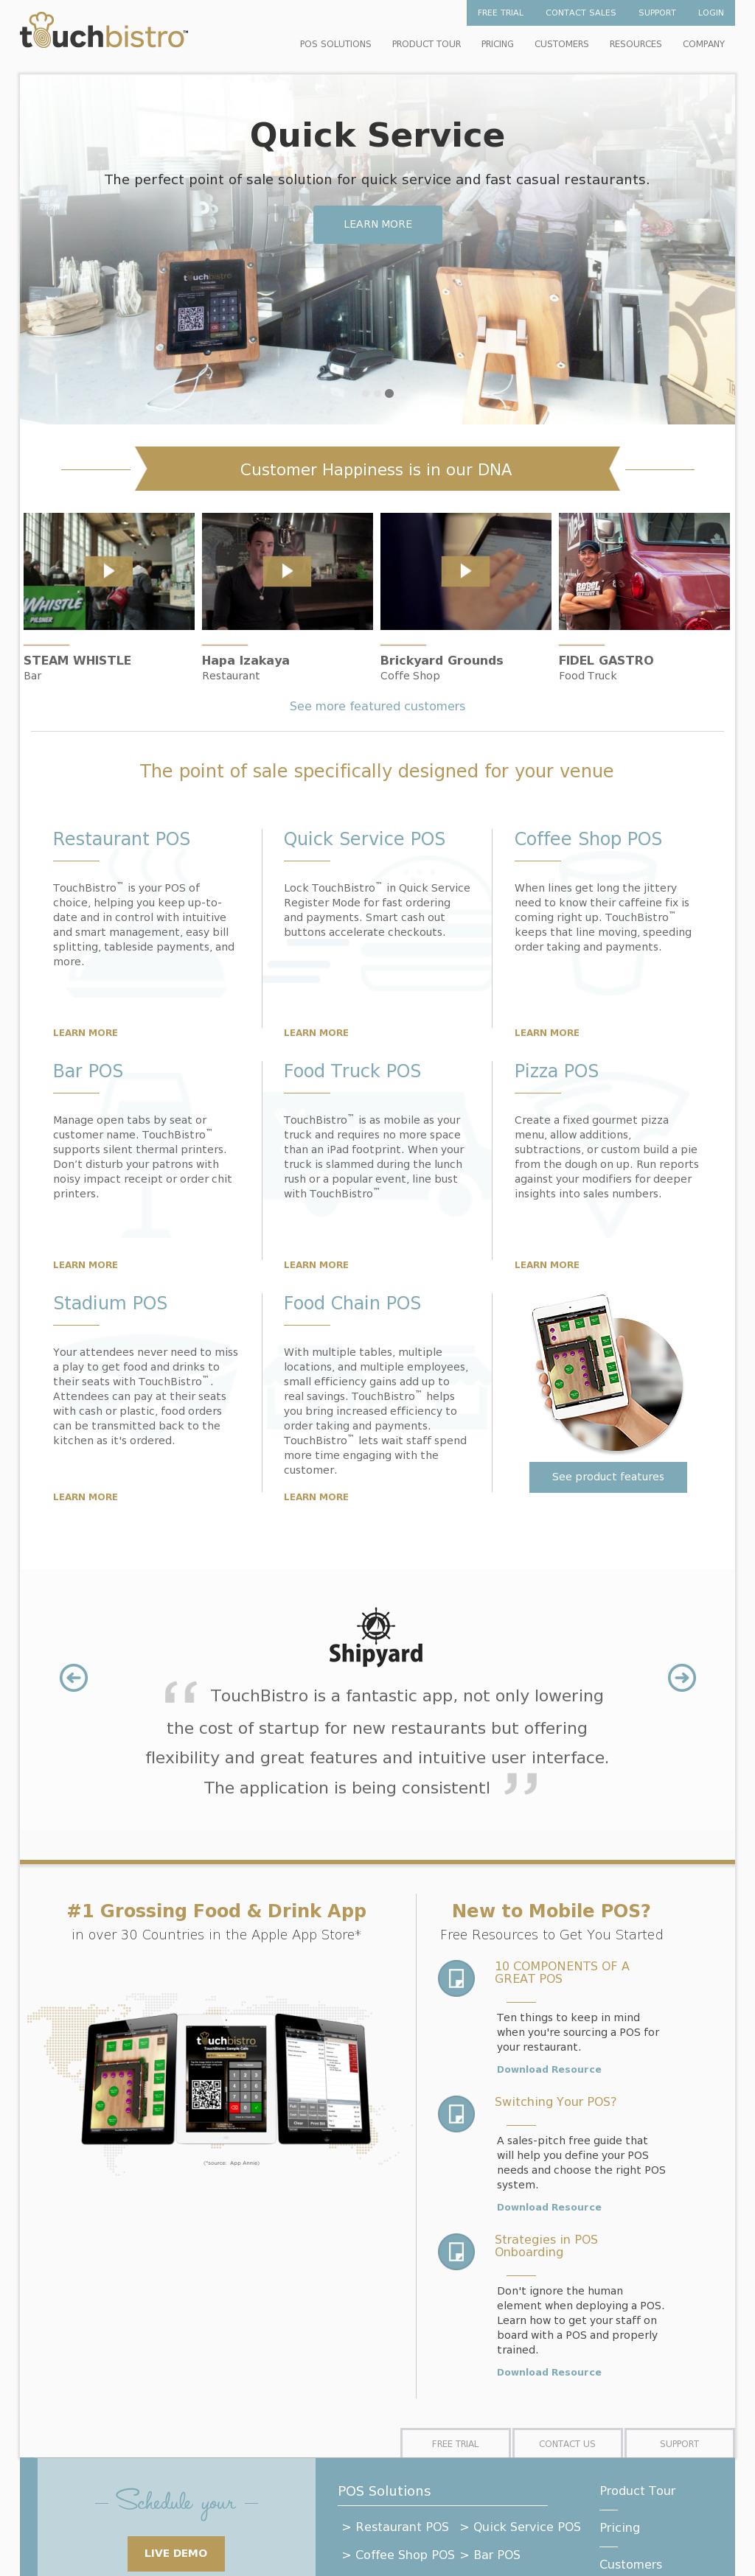 TouchBistro Competitors, Revenue and Employees - Owler Company Profile